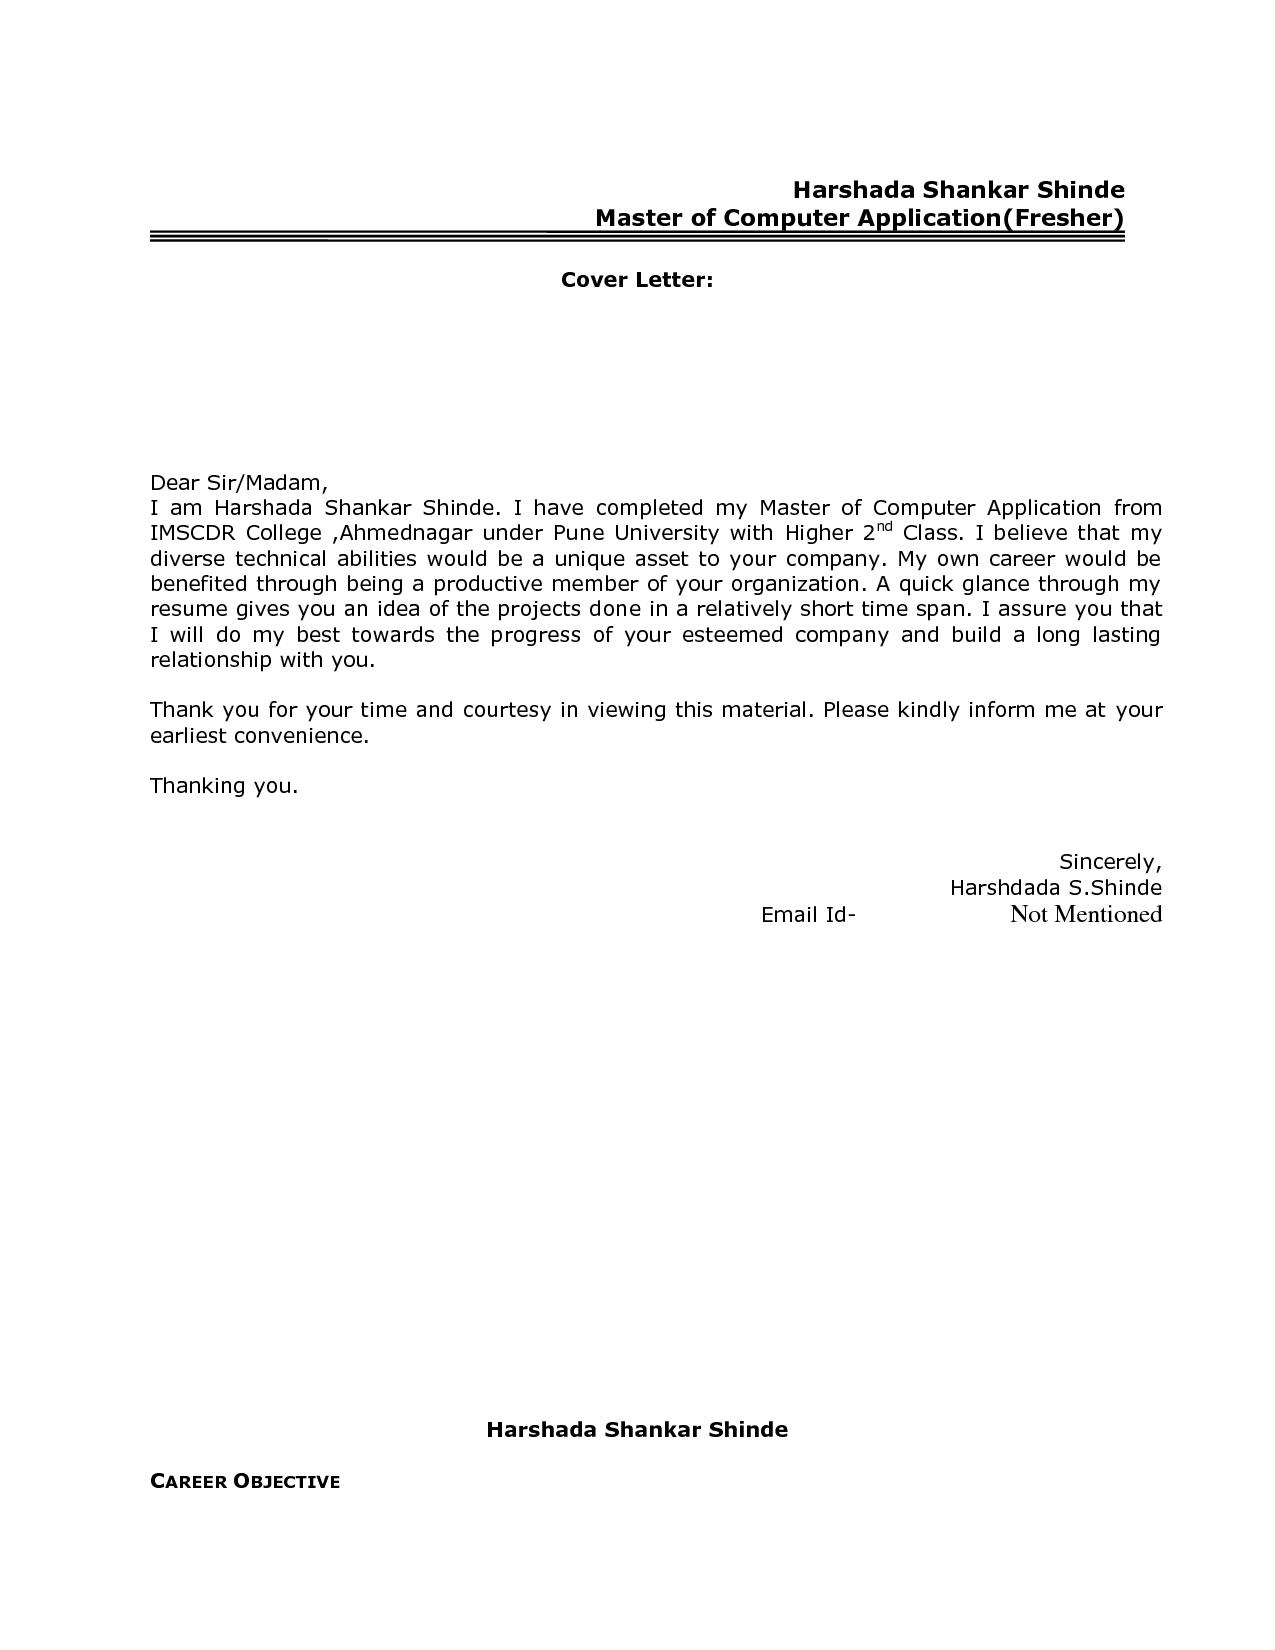 Resume Application Cover Letter